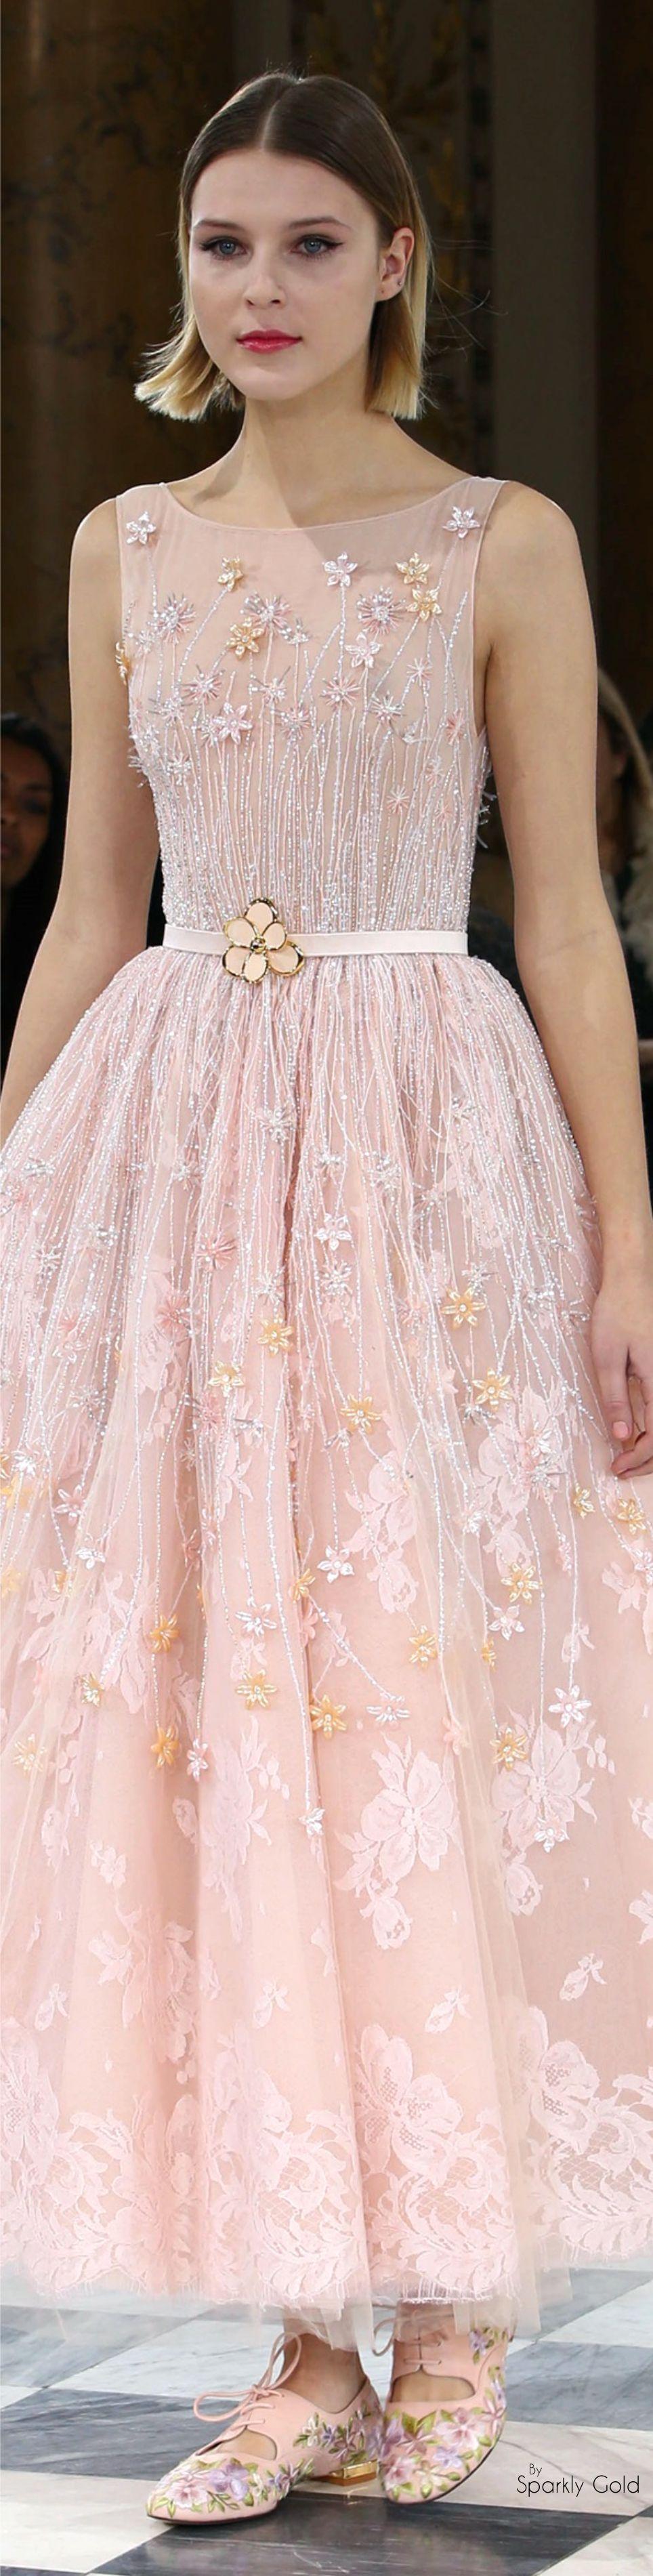 Georges Hobeika Spring 2016 Couture   Moda   Pinterest   Vestiditos ...